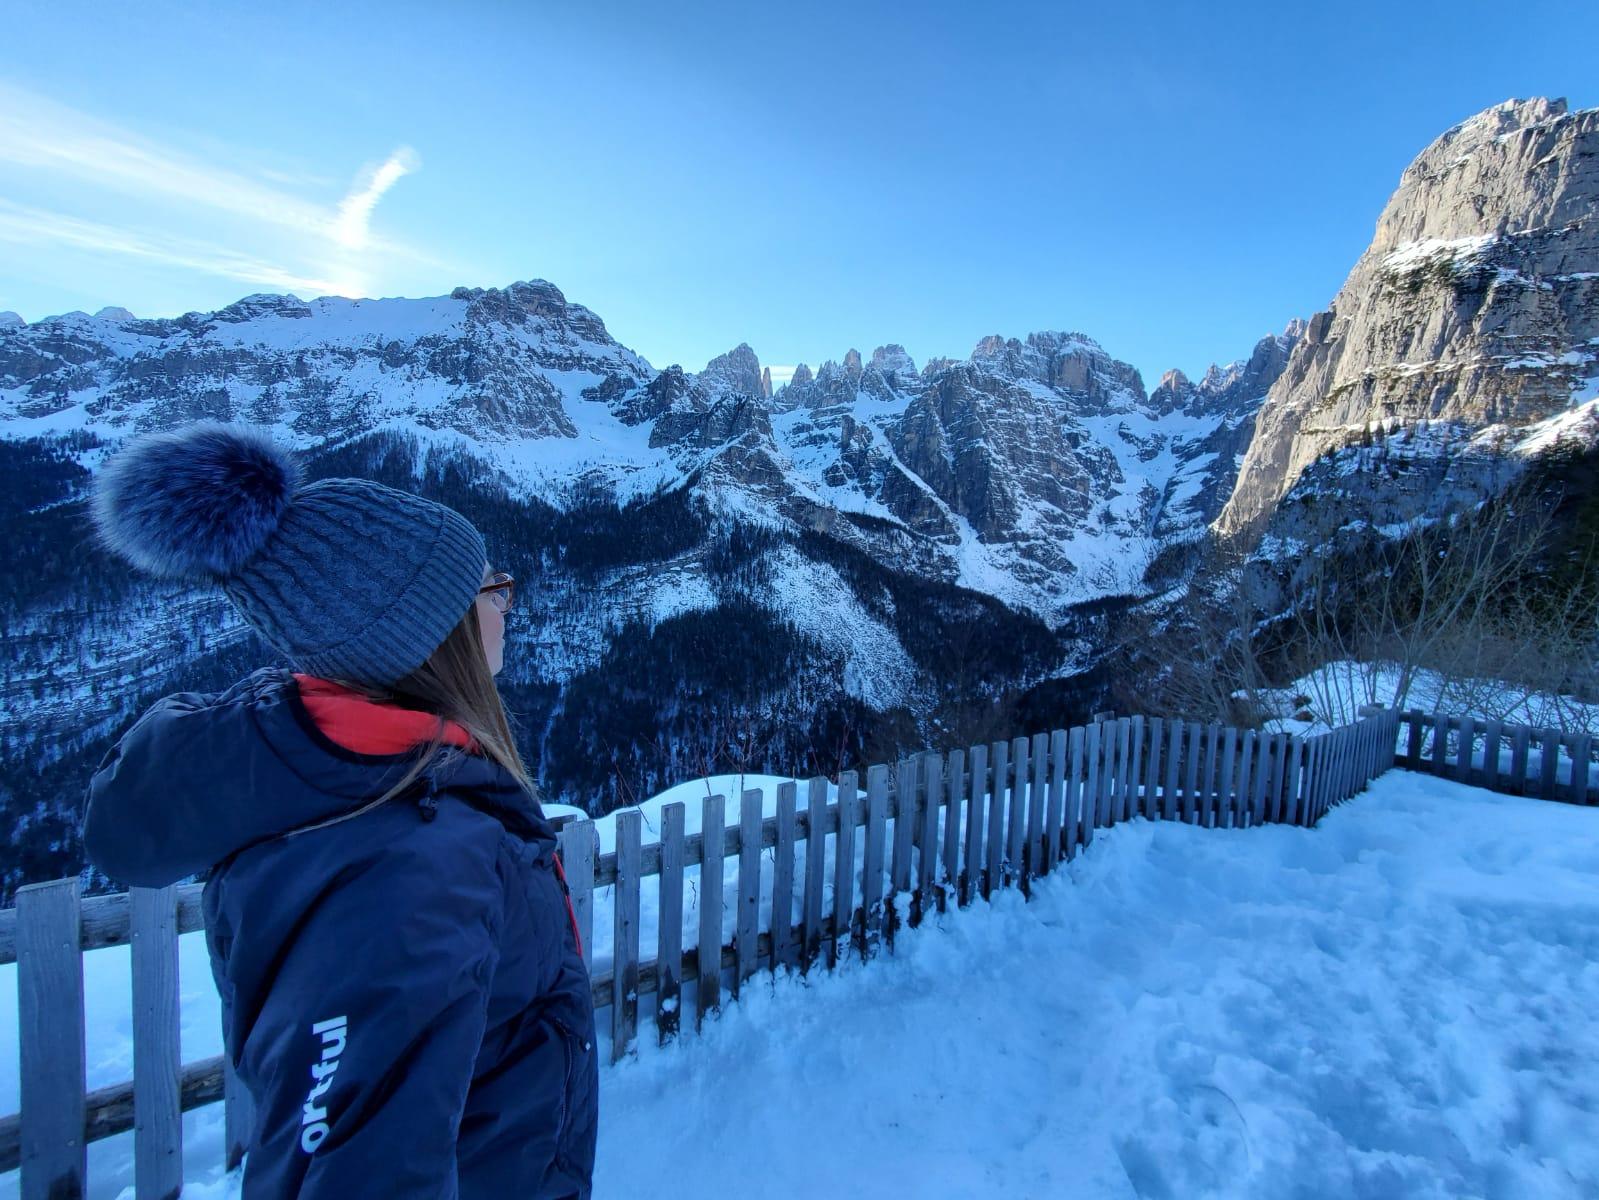 Winter_sguardo_verso_montagne.jpg